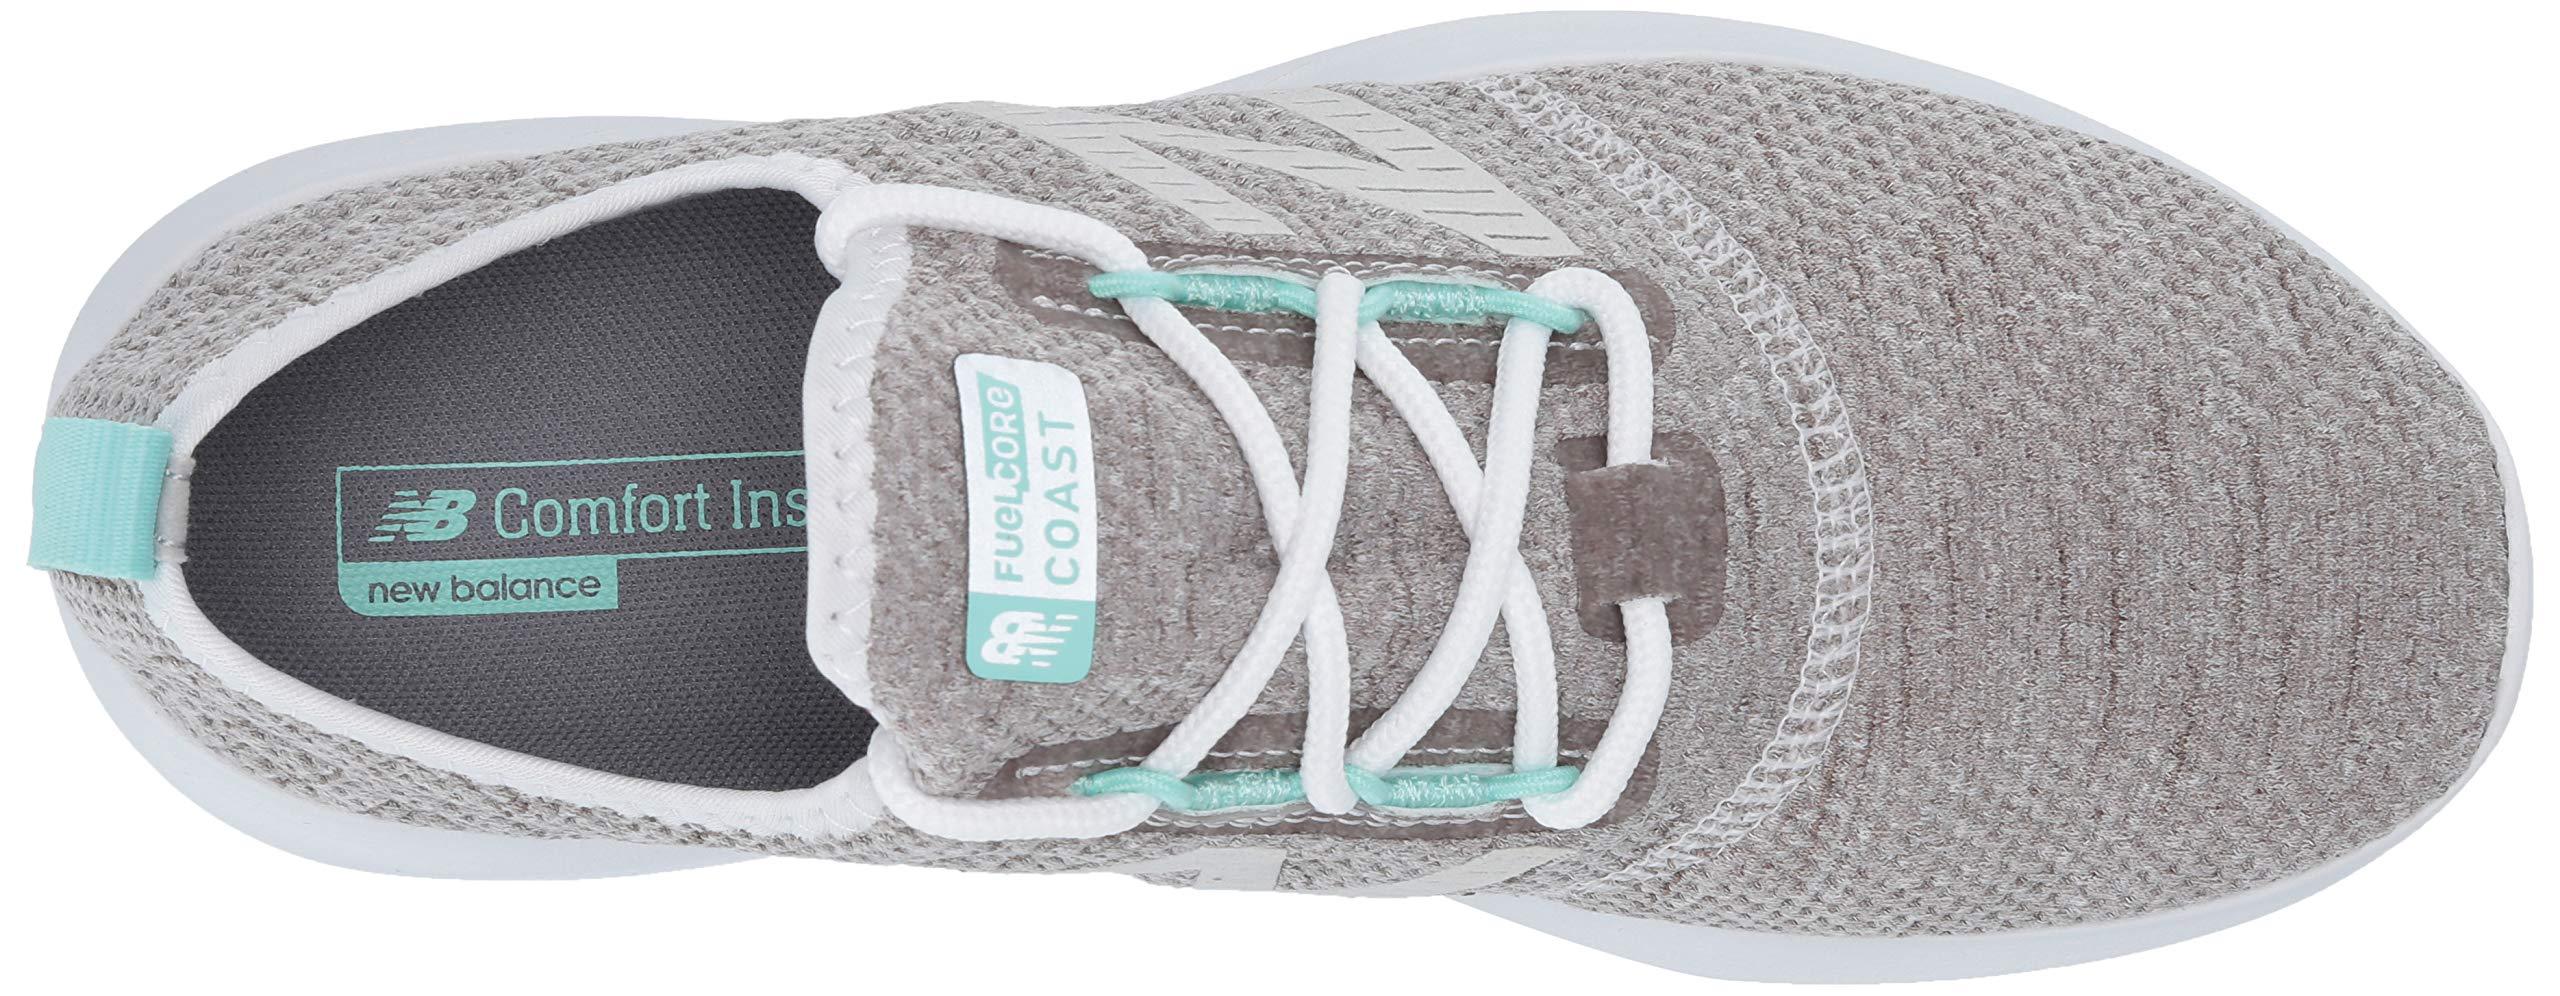 81LGASsfvDL - New Balance Women's Fuel Core Coast V4 Running Shoes